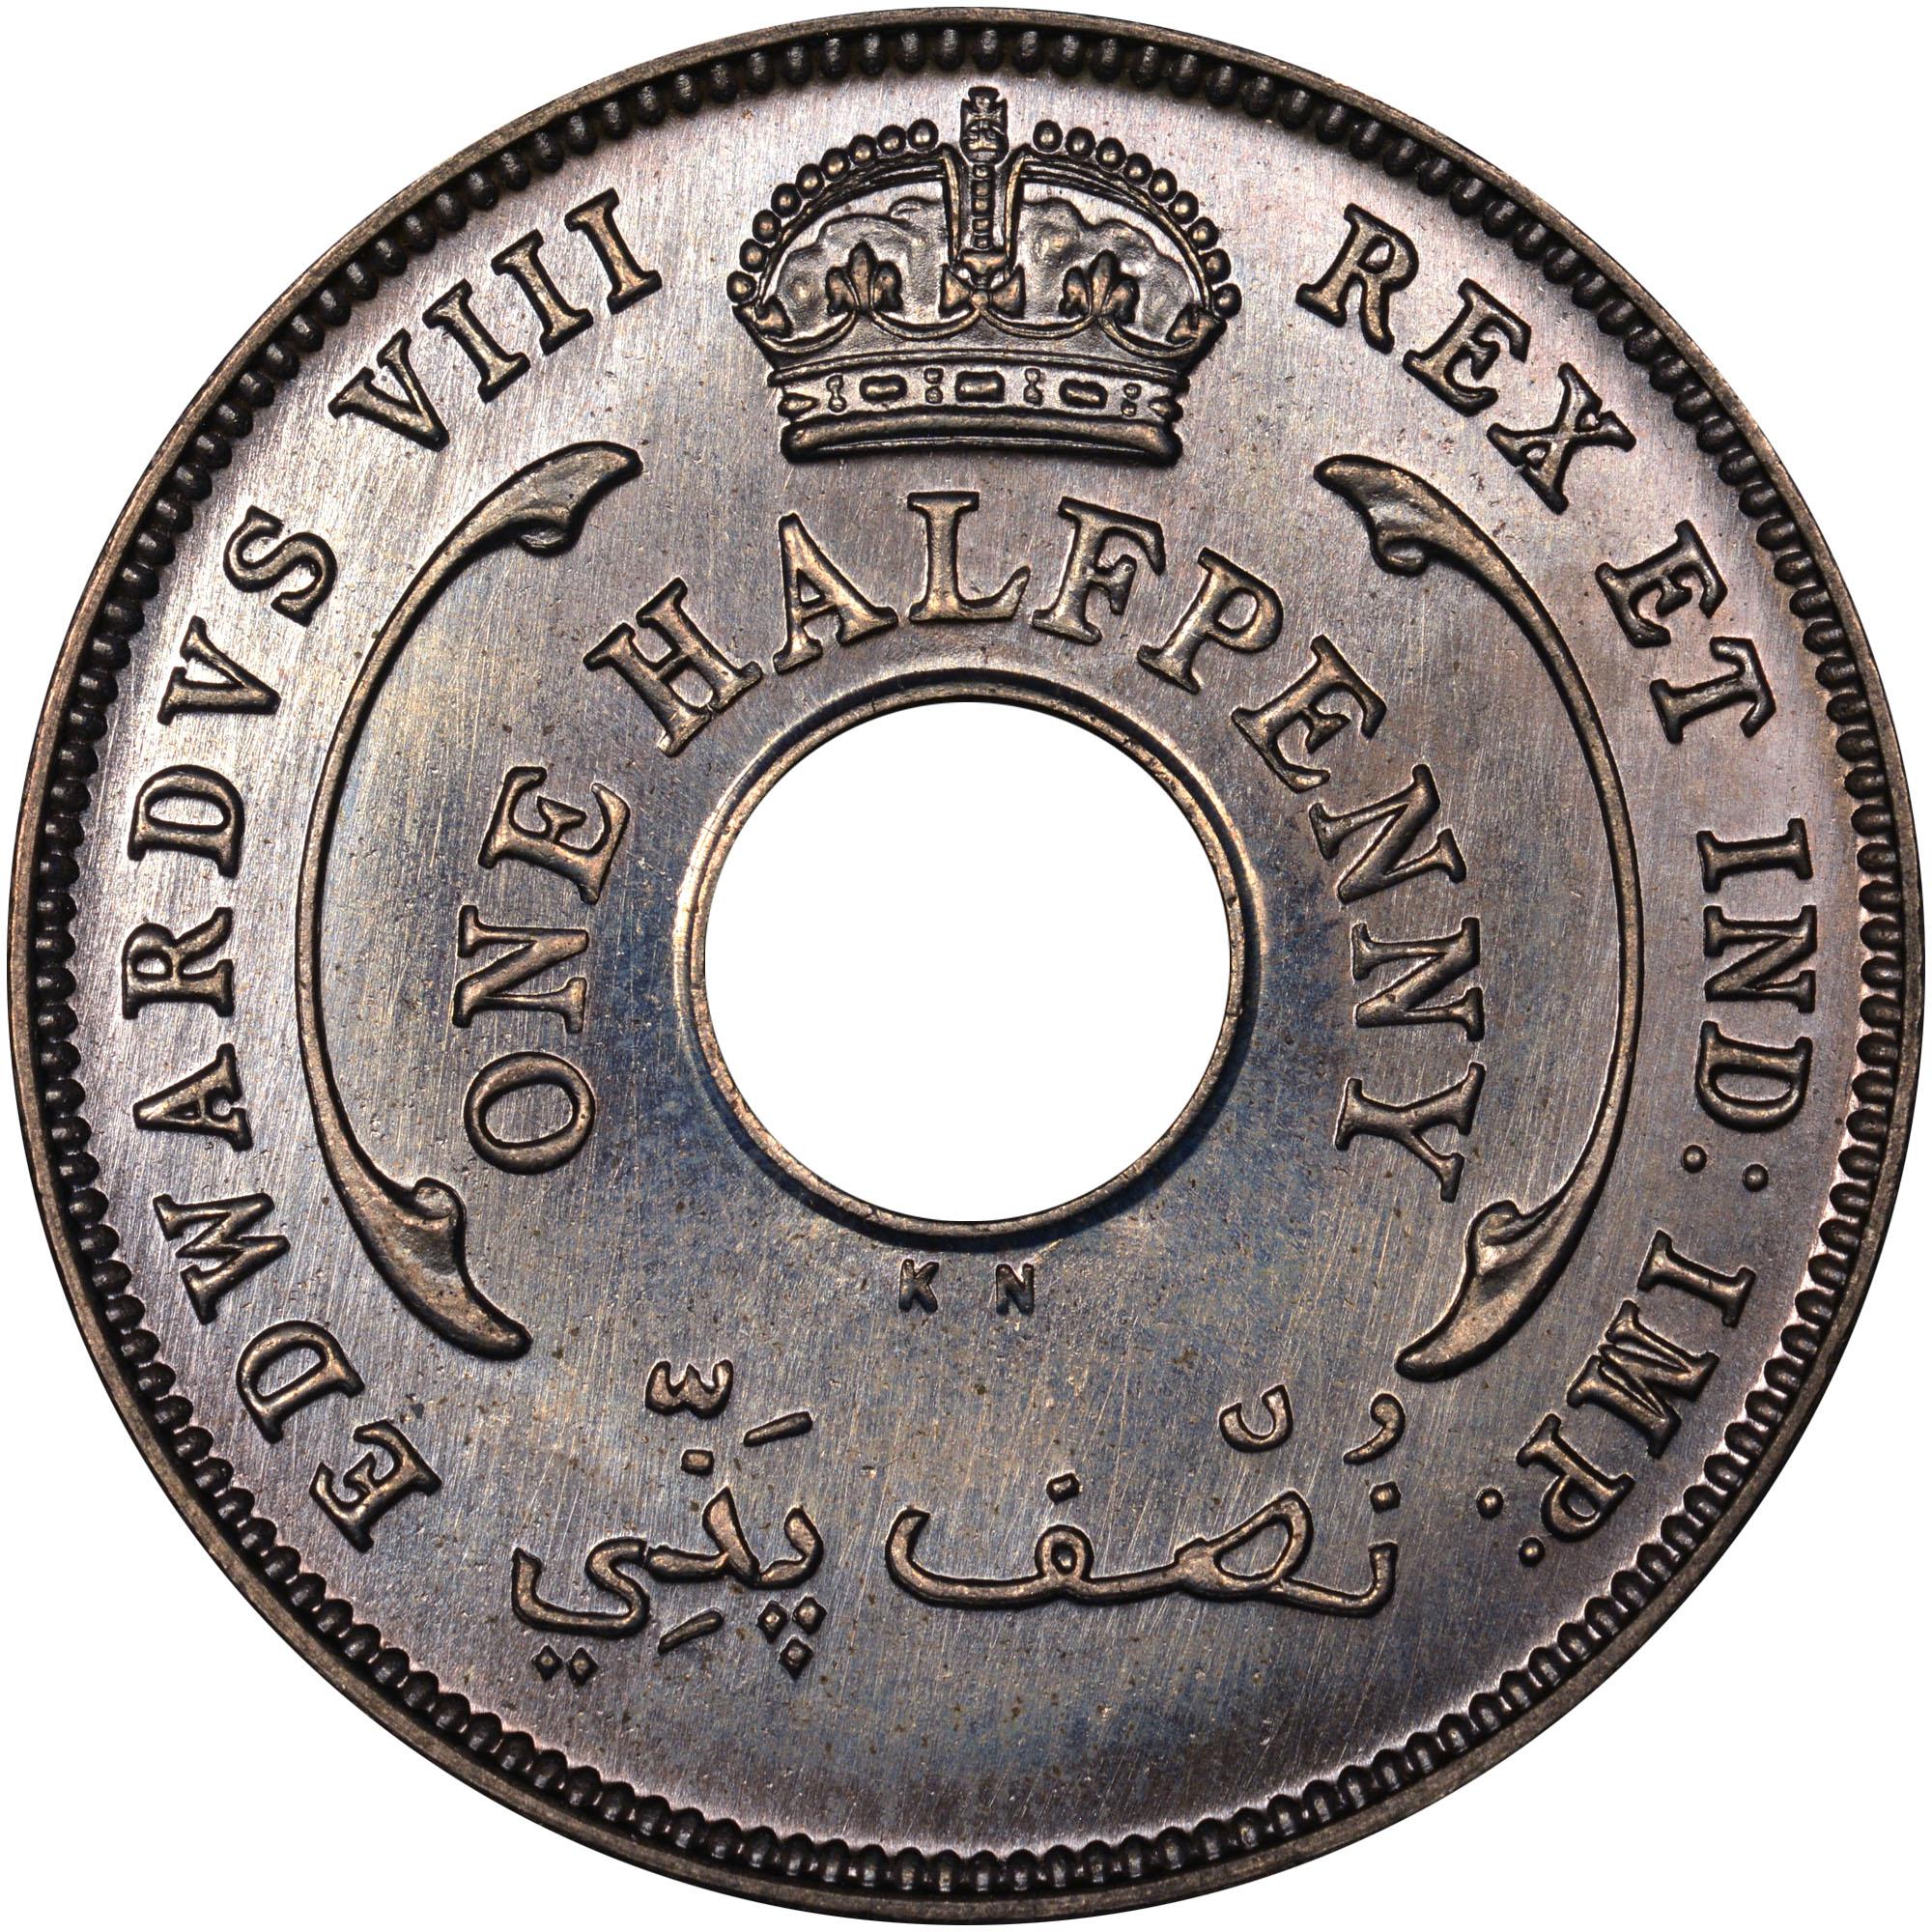 1936 British West Africa 1/2 Penny obverse